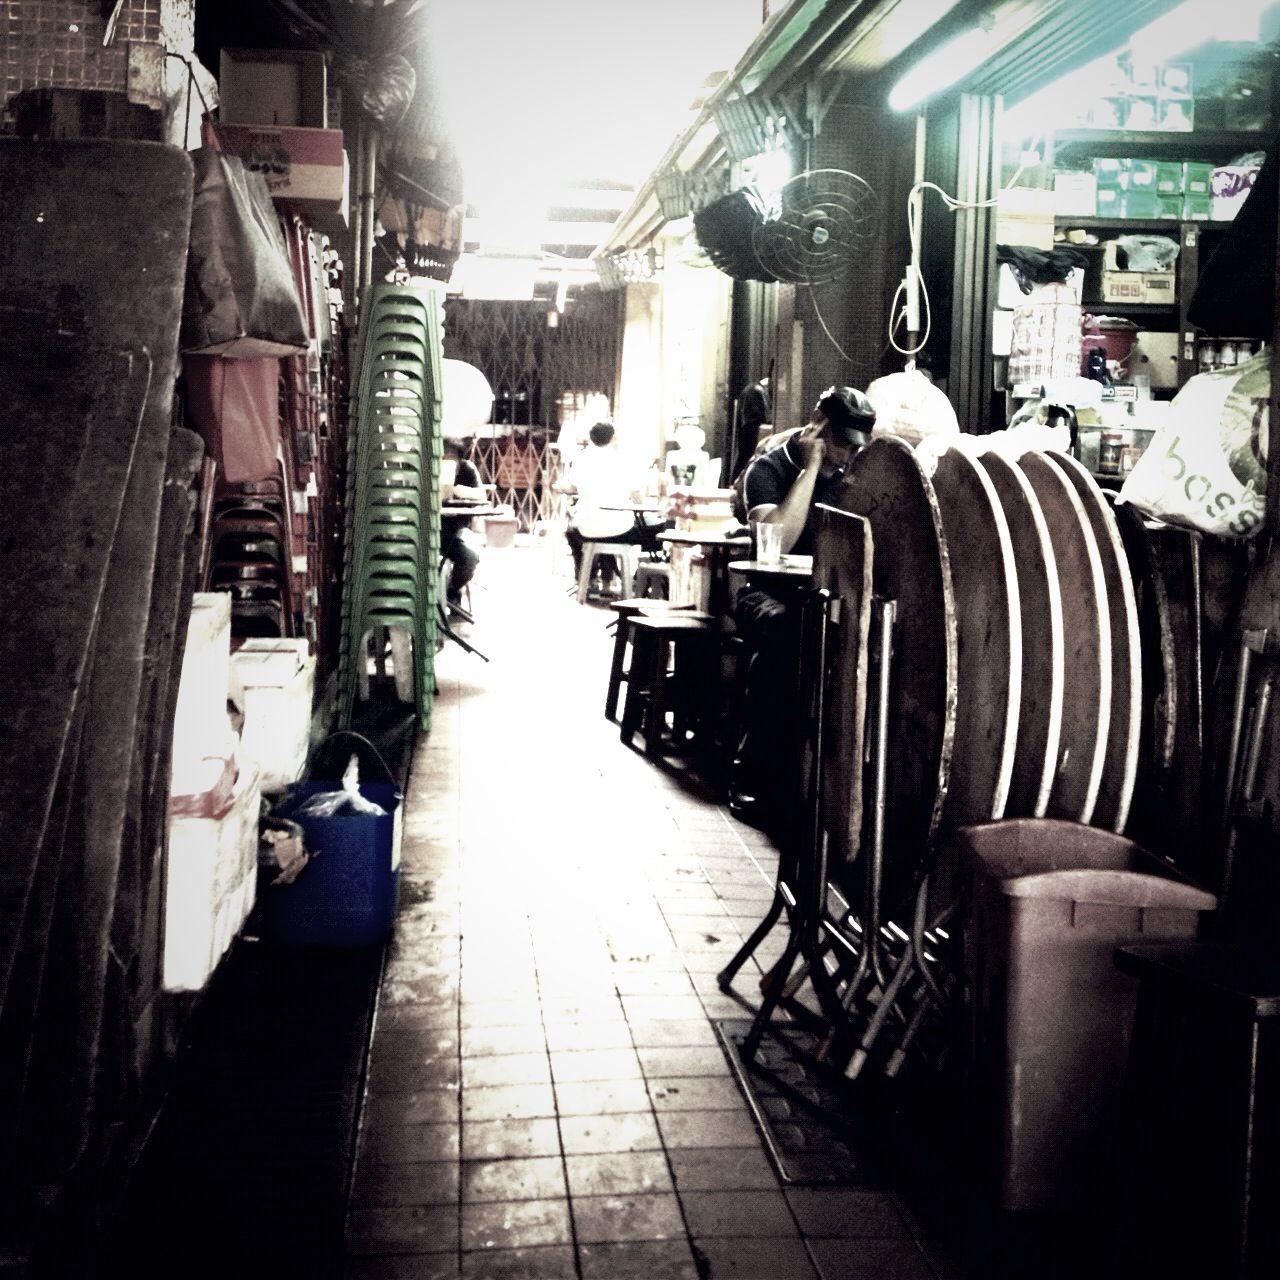 tea time at 西苑強記咖啡食店 Tea Time